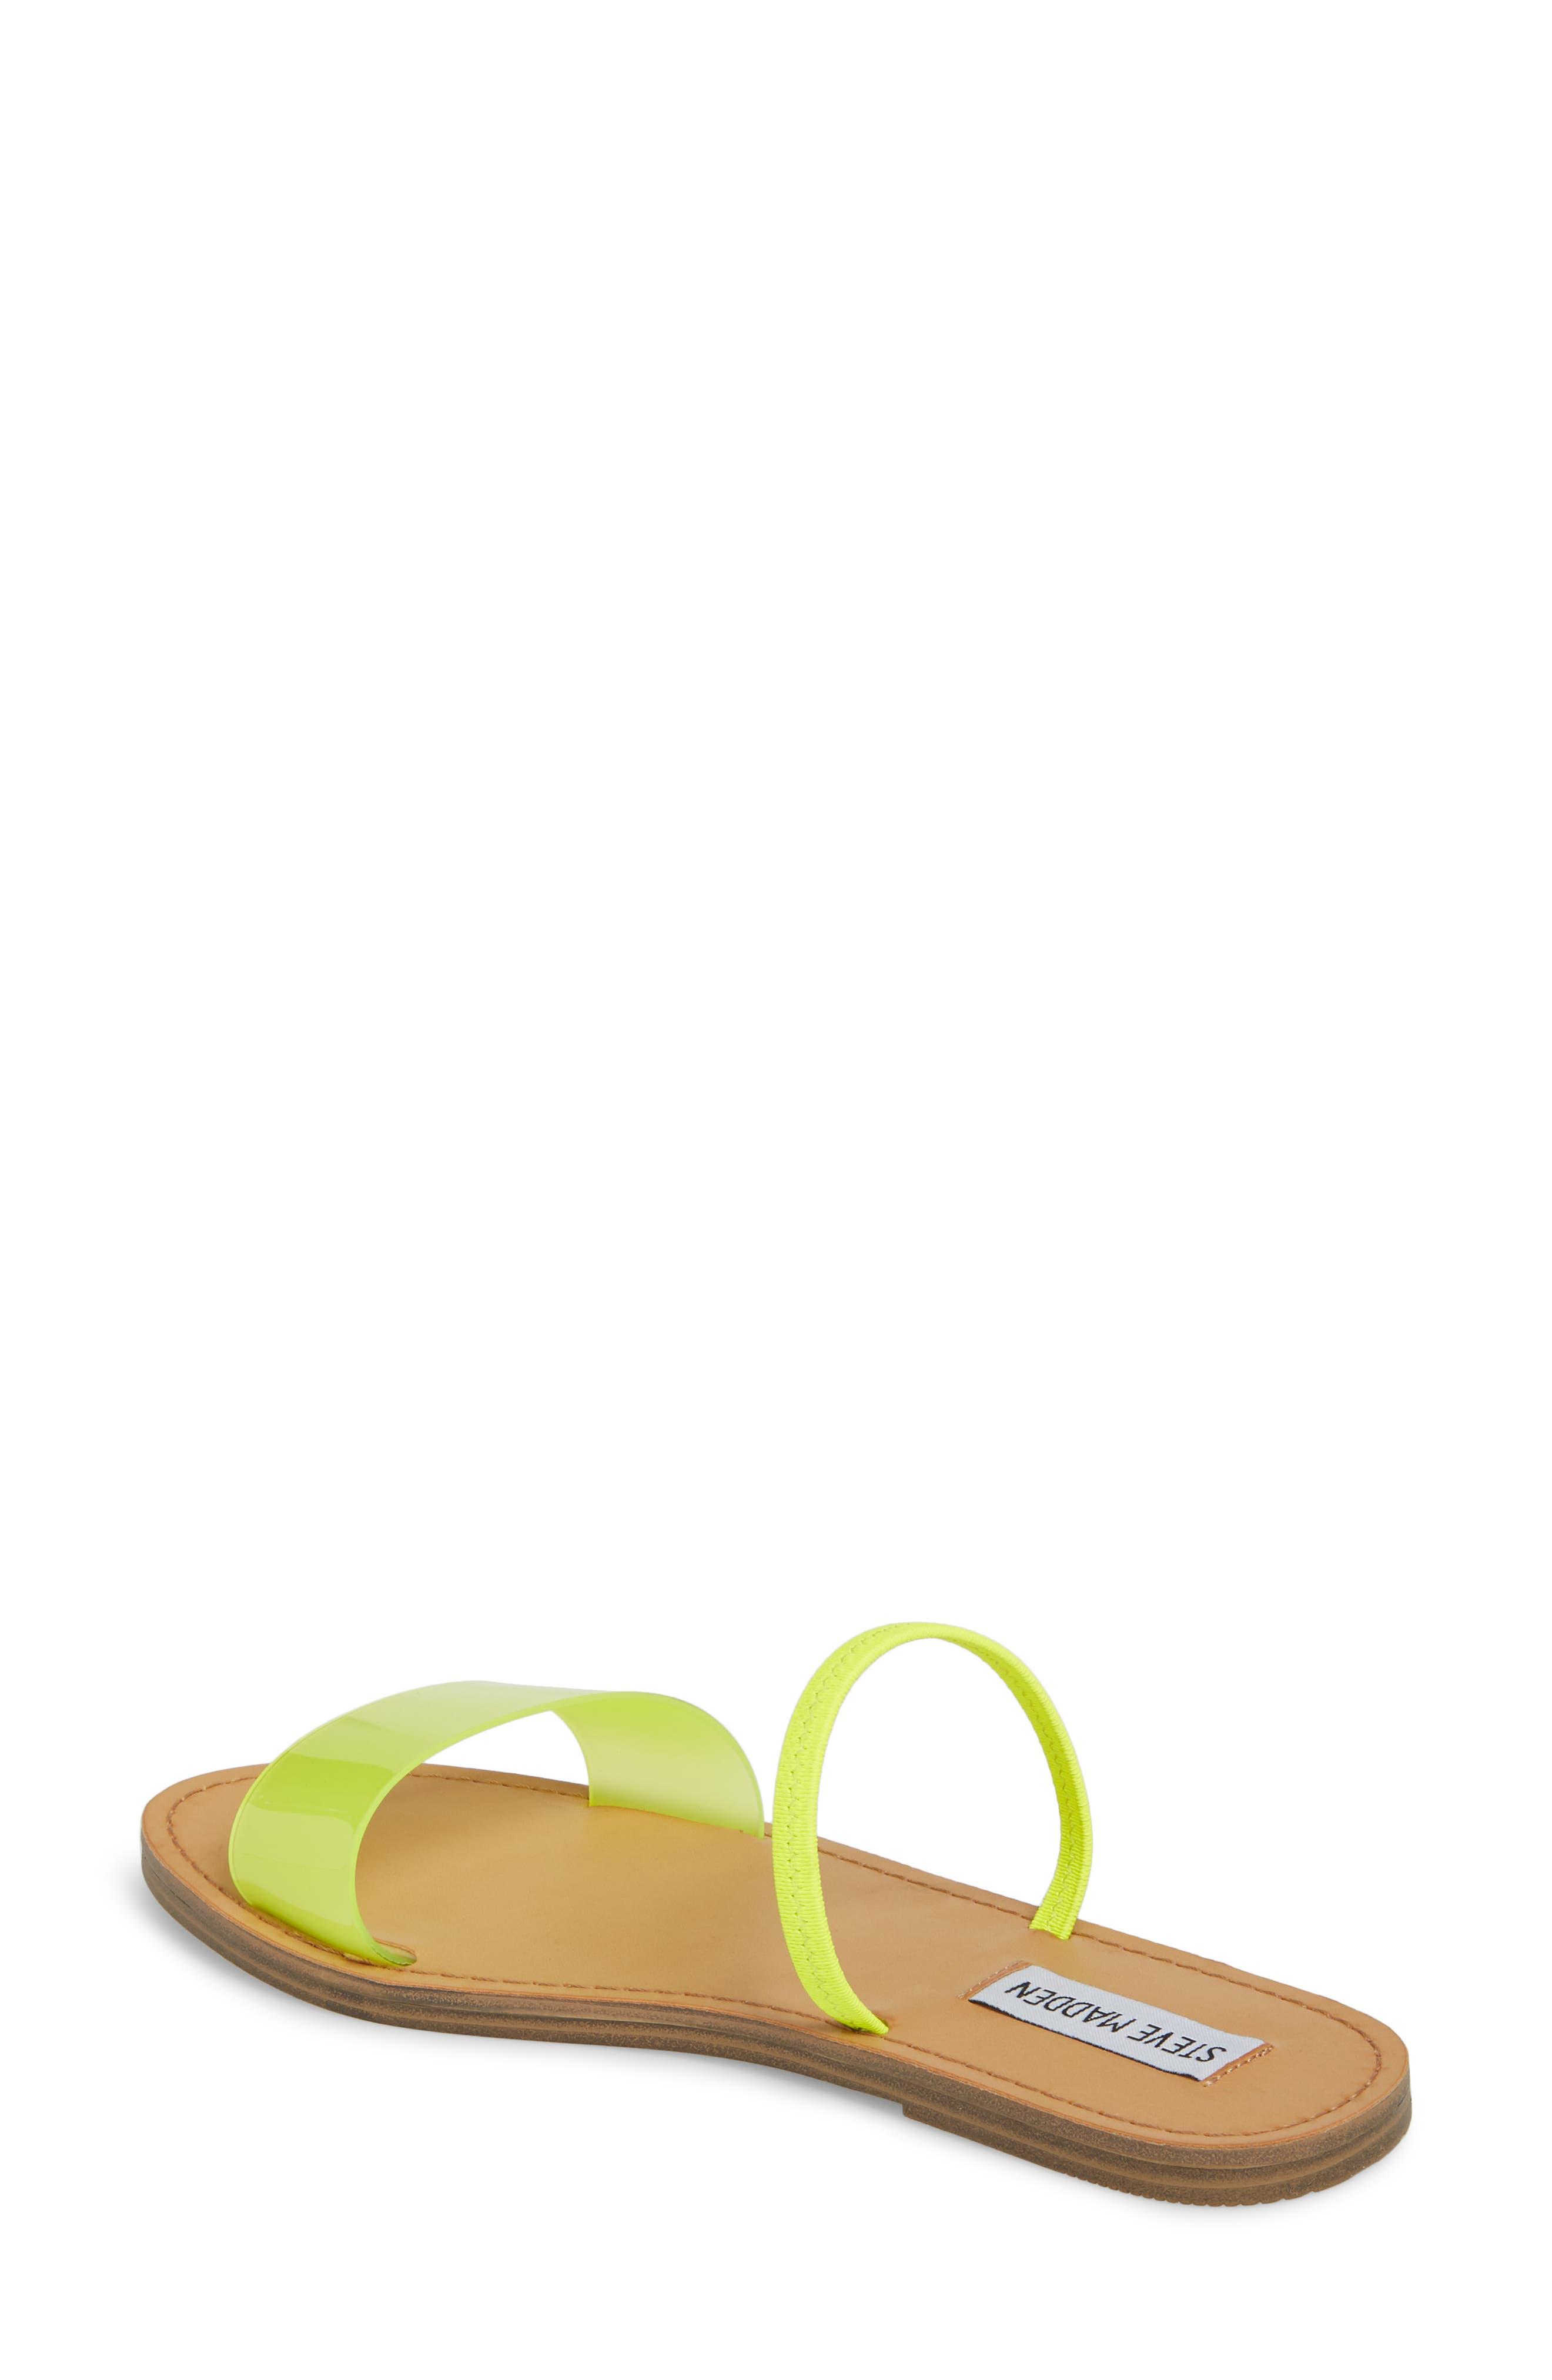 Dasha Strappy Slide Sandal,                             Alternate thumbnail 7, color,